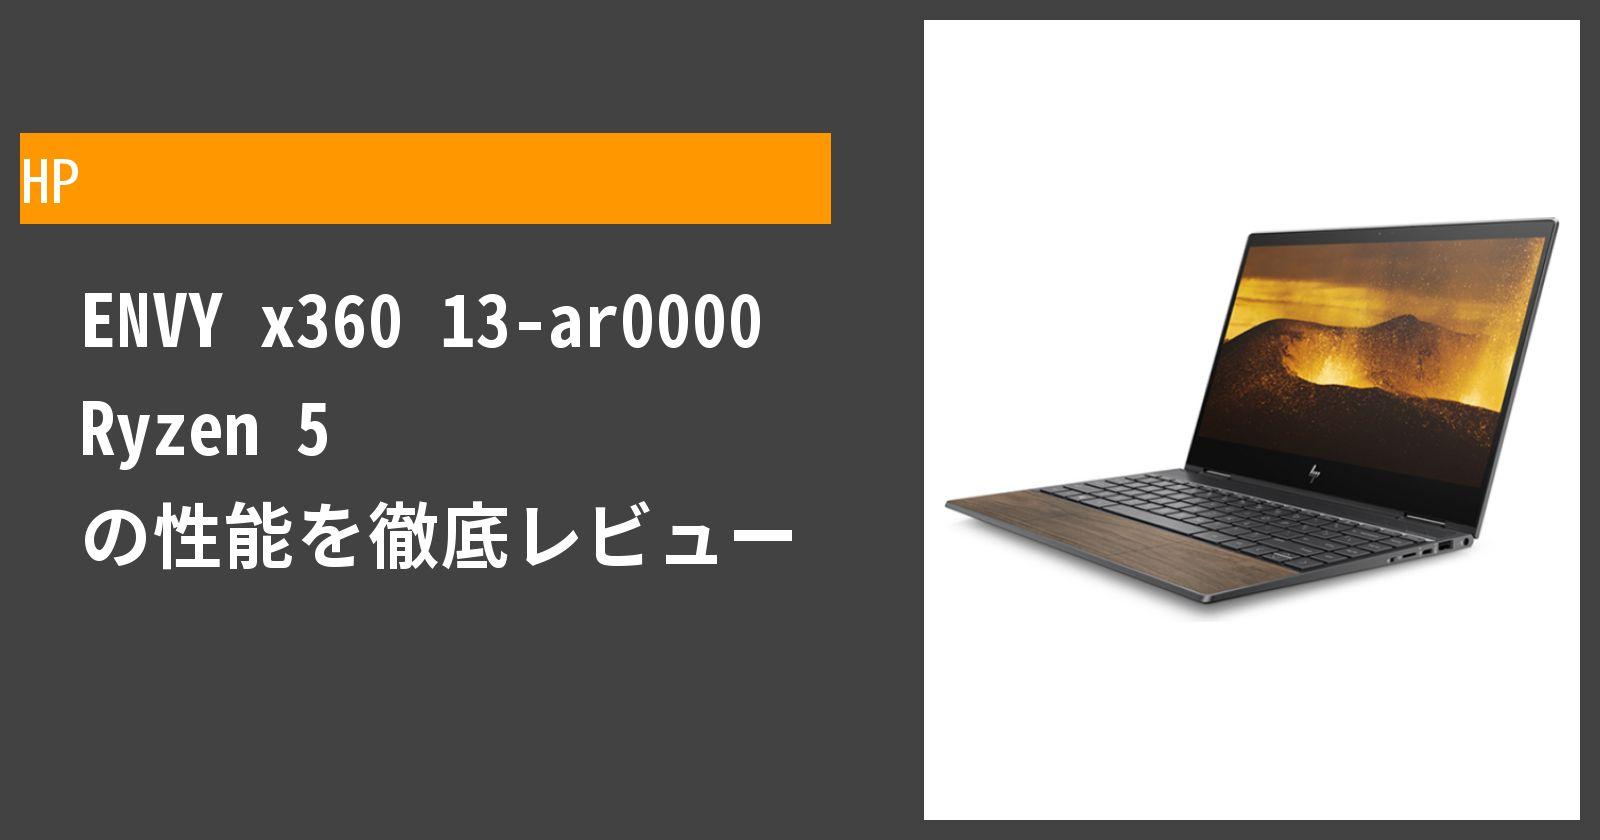 ENVY x360 13-ar0000 Ryzen 5 の性能を徹底レビュー